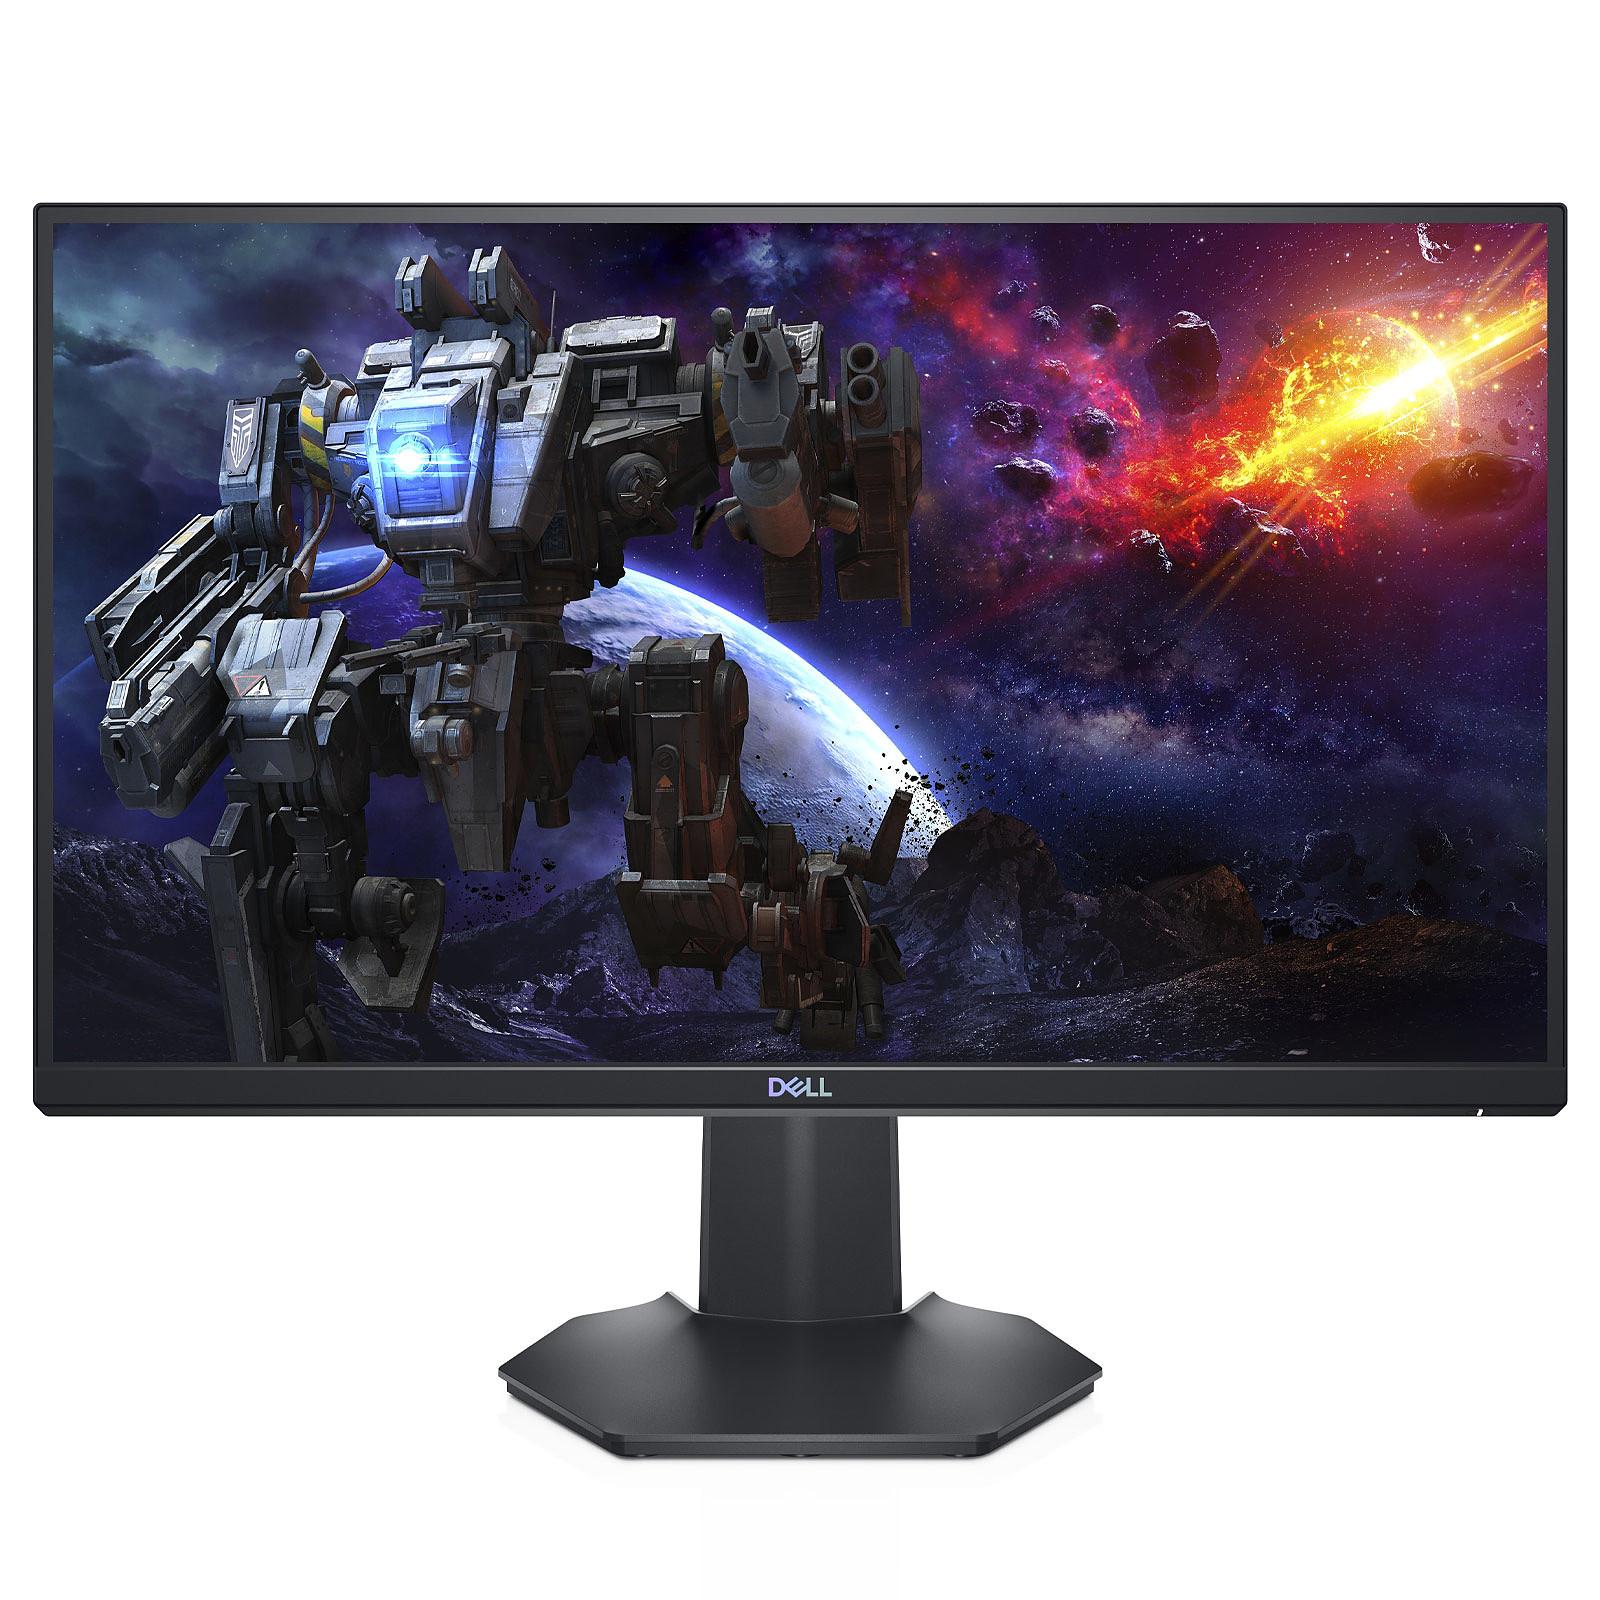 "Ecran PC gamer 24"" Dell S2421HGF - Full HD, 144 Hz, Dalle TN, 1ms, FreeSync / G-sync compatible, Pied Réglable"